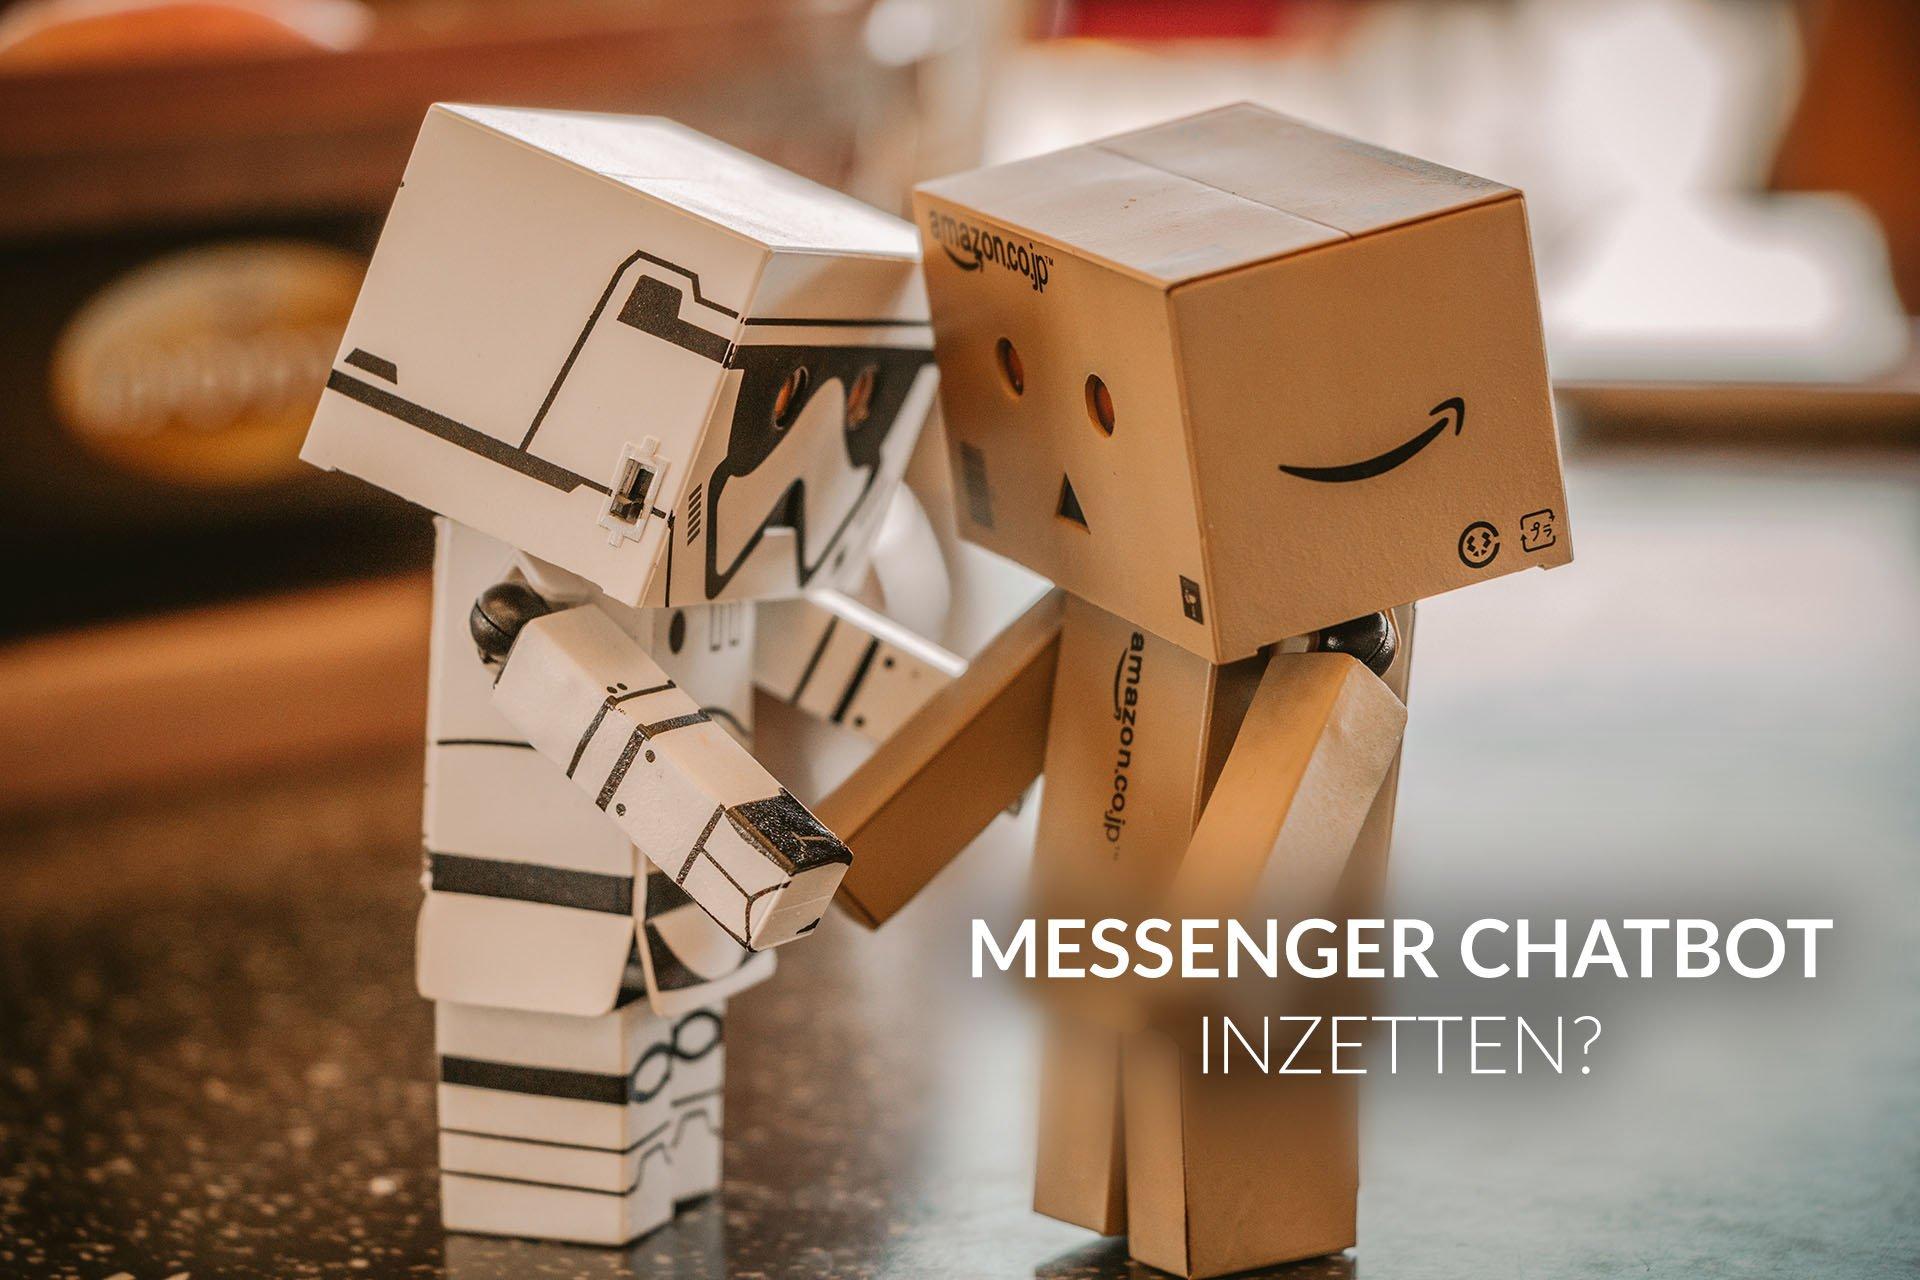 messenger chatbot inzetten interview - twee kartonnen chatbots